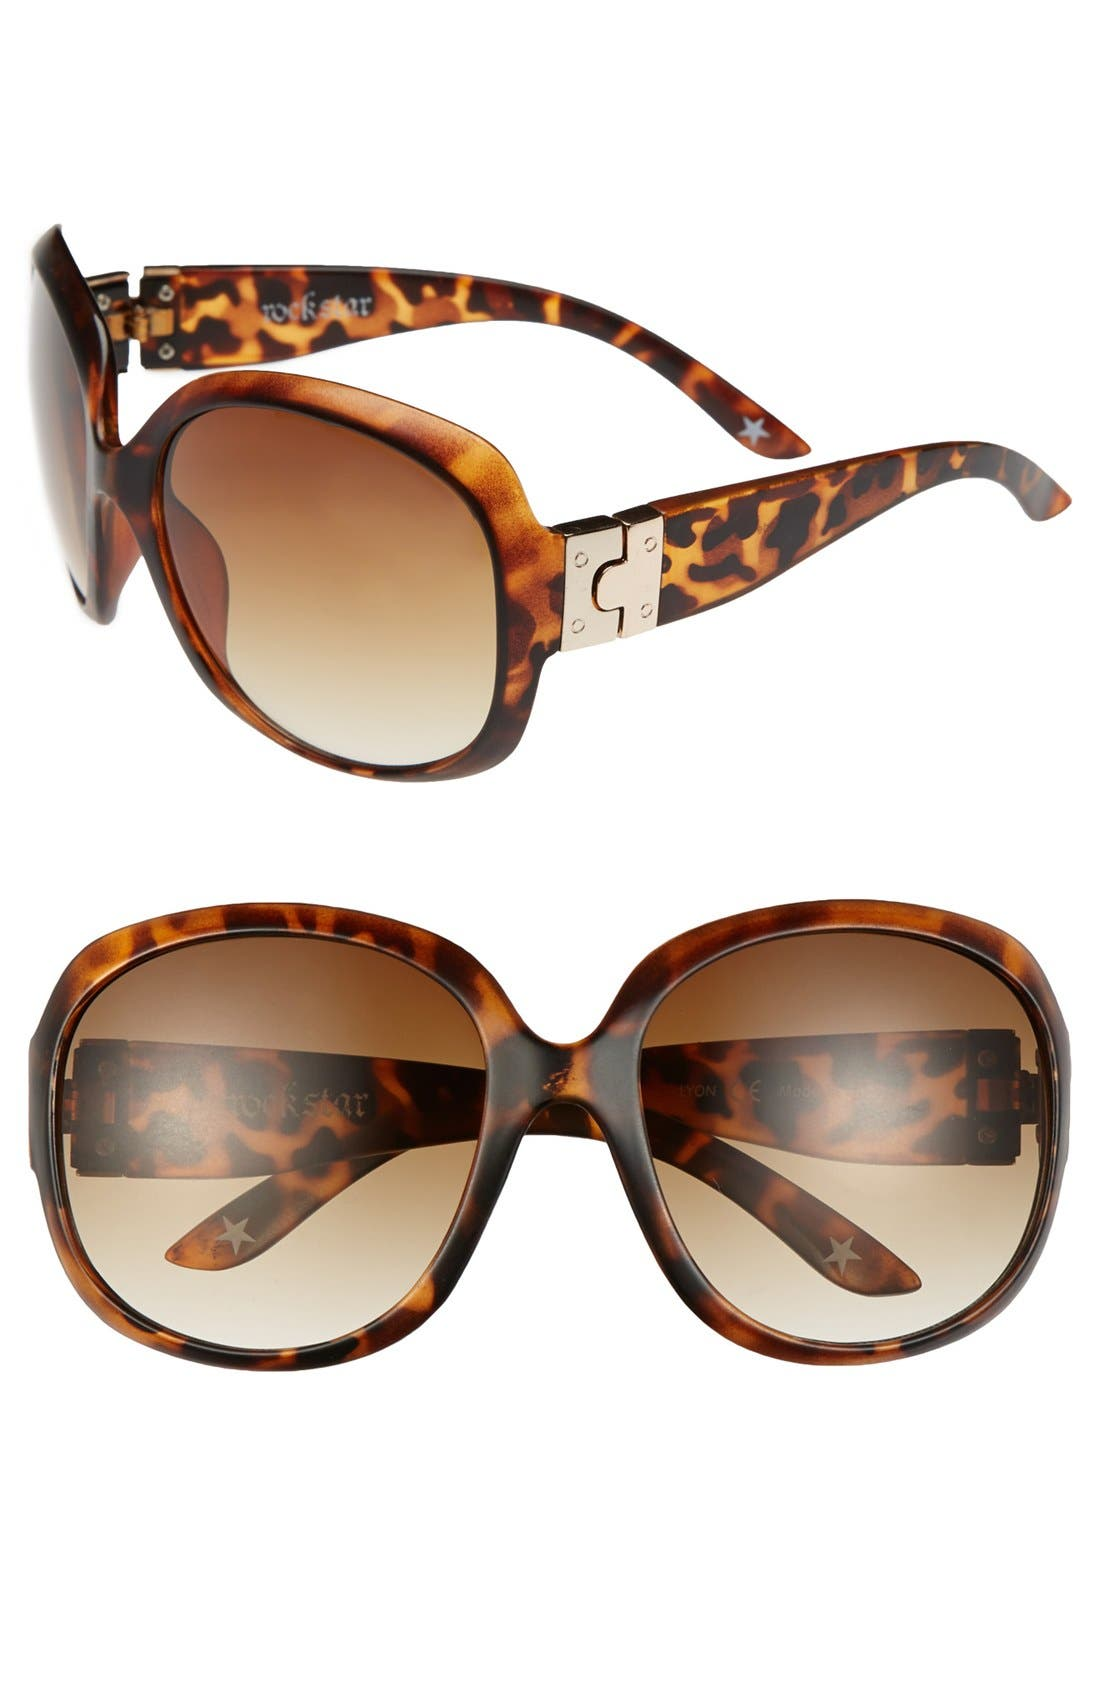 Alternate Image 1 Selected - Leith 'Anna' Oversized Sunglasses